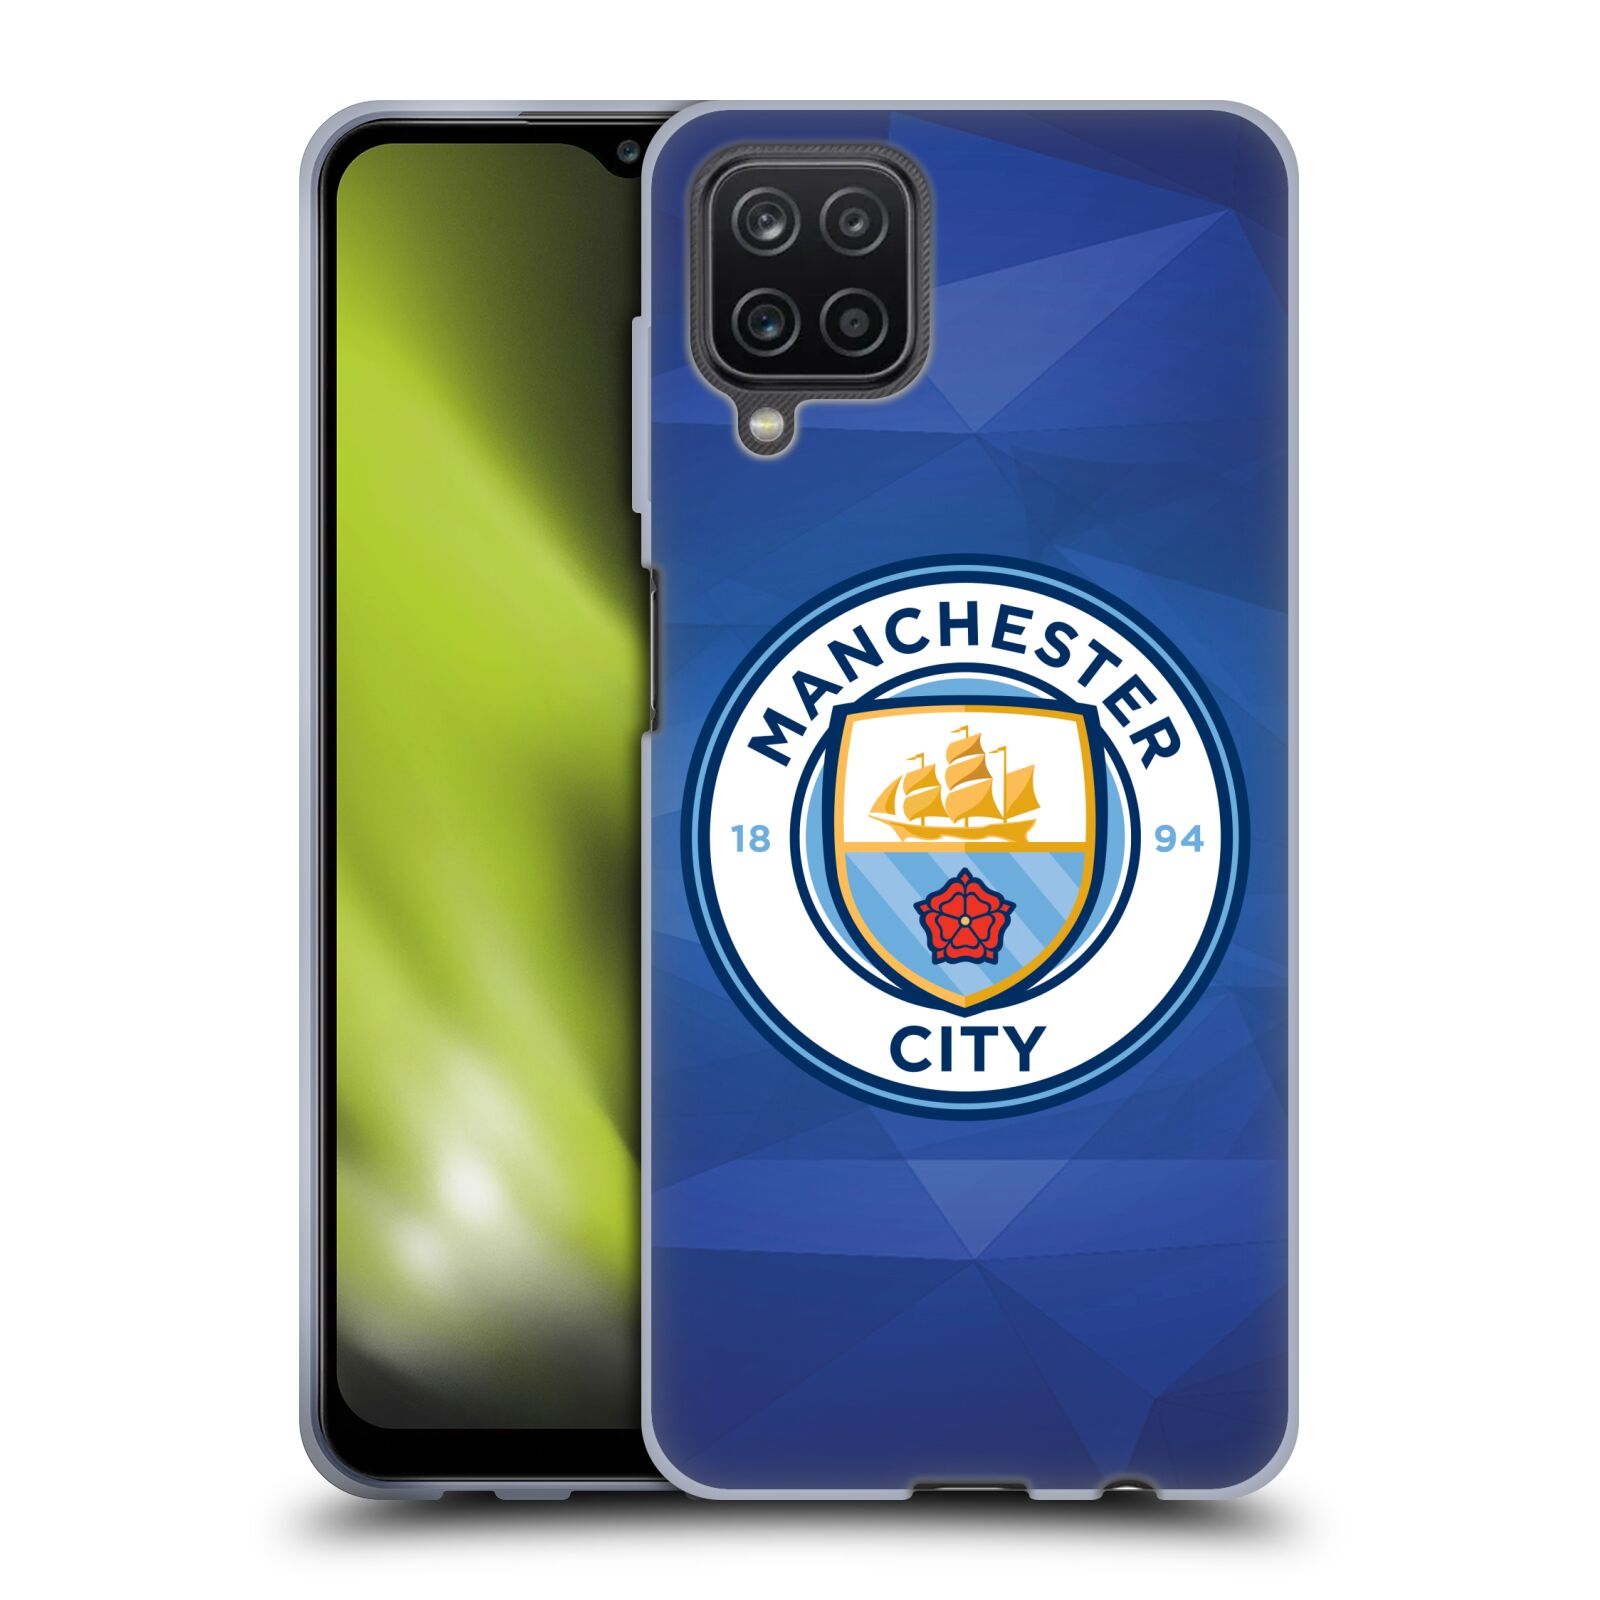 Silikonové pouzdro na mobil Samsung Galaxy A12 - Head Case - Manchester City FC - Modré nové logo